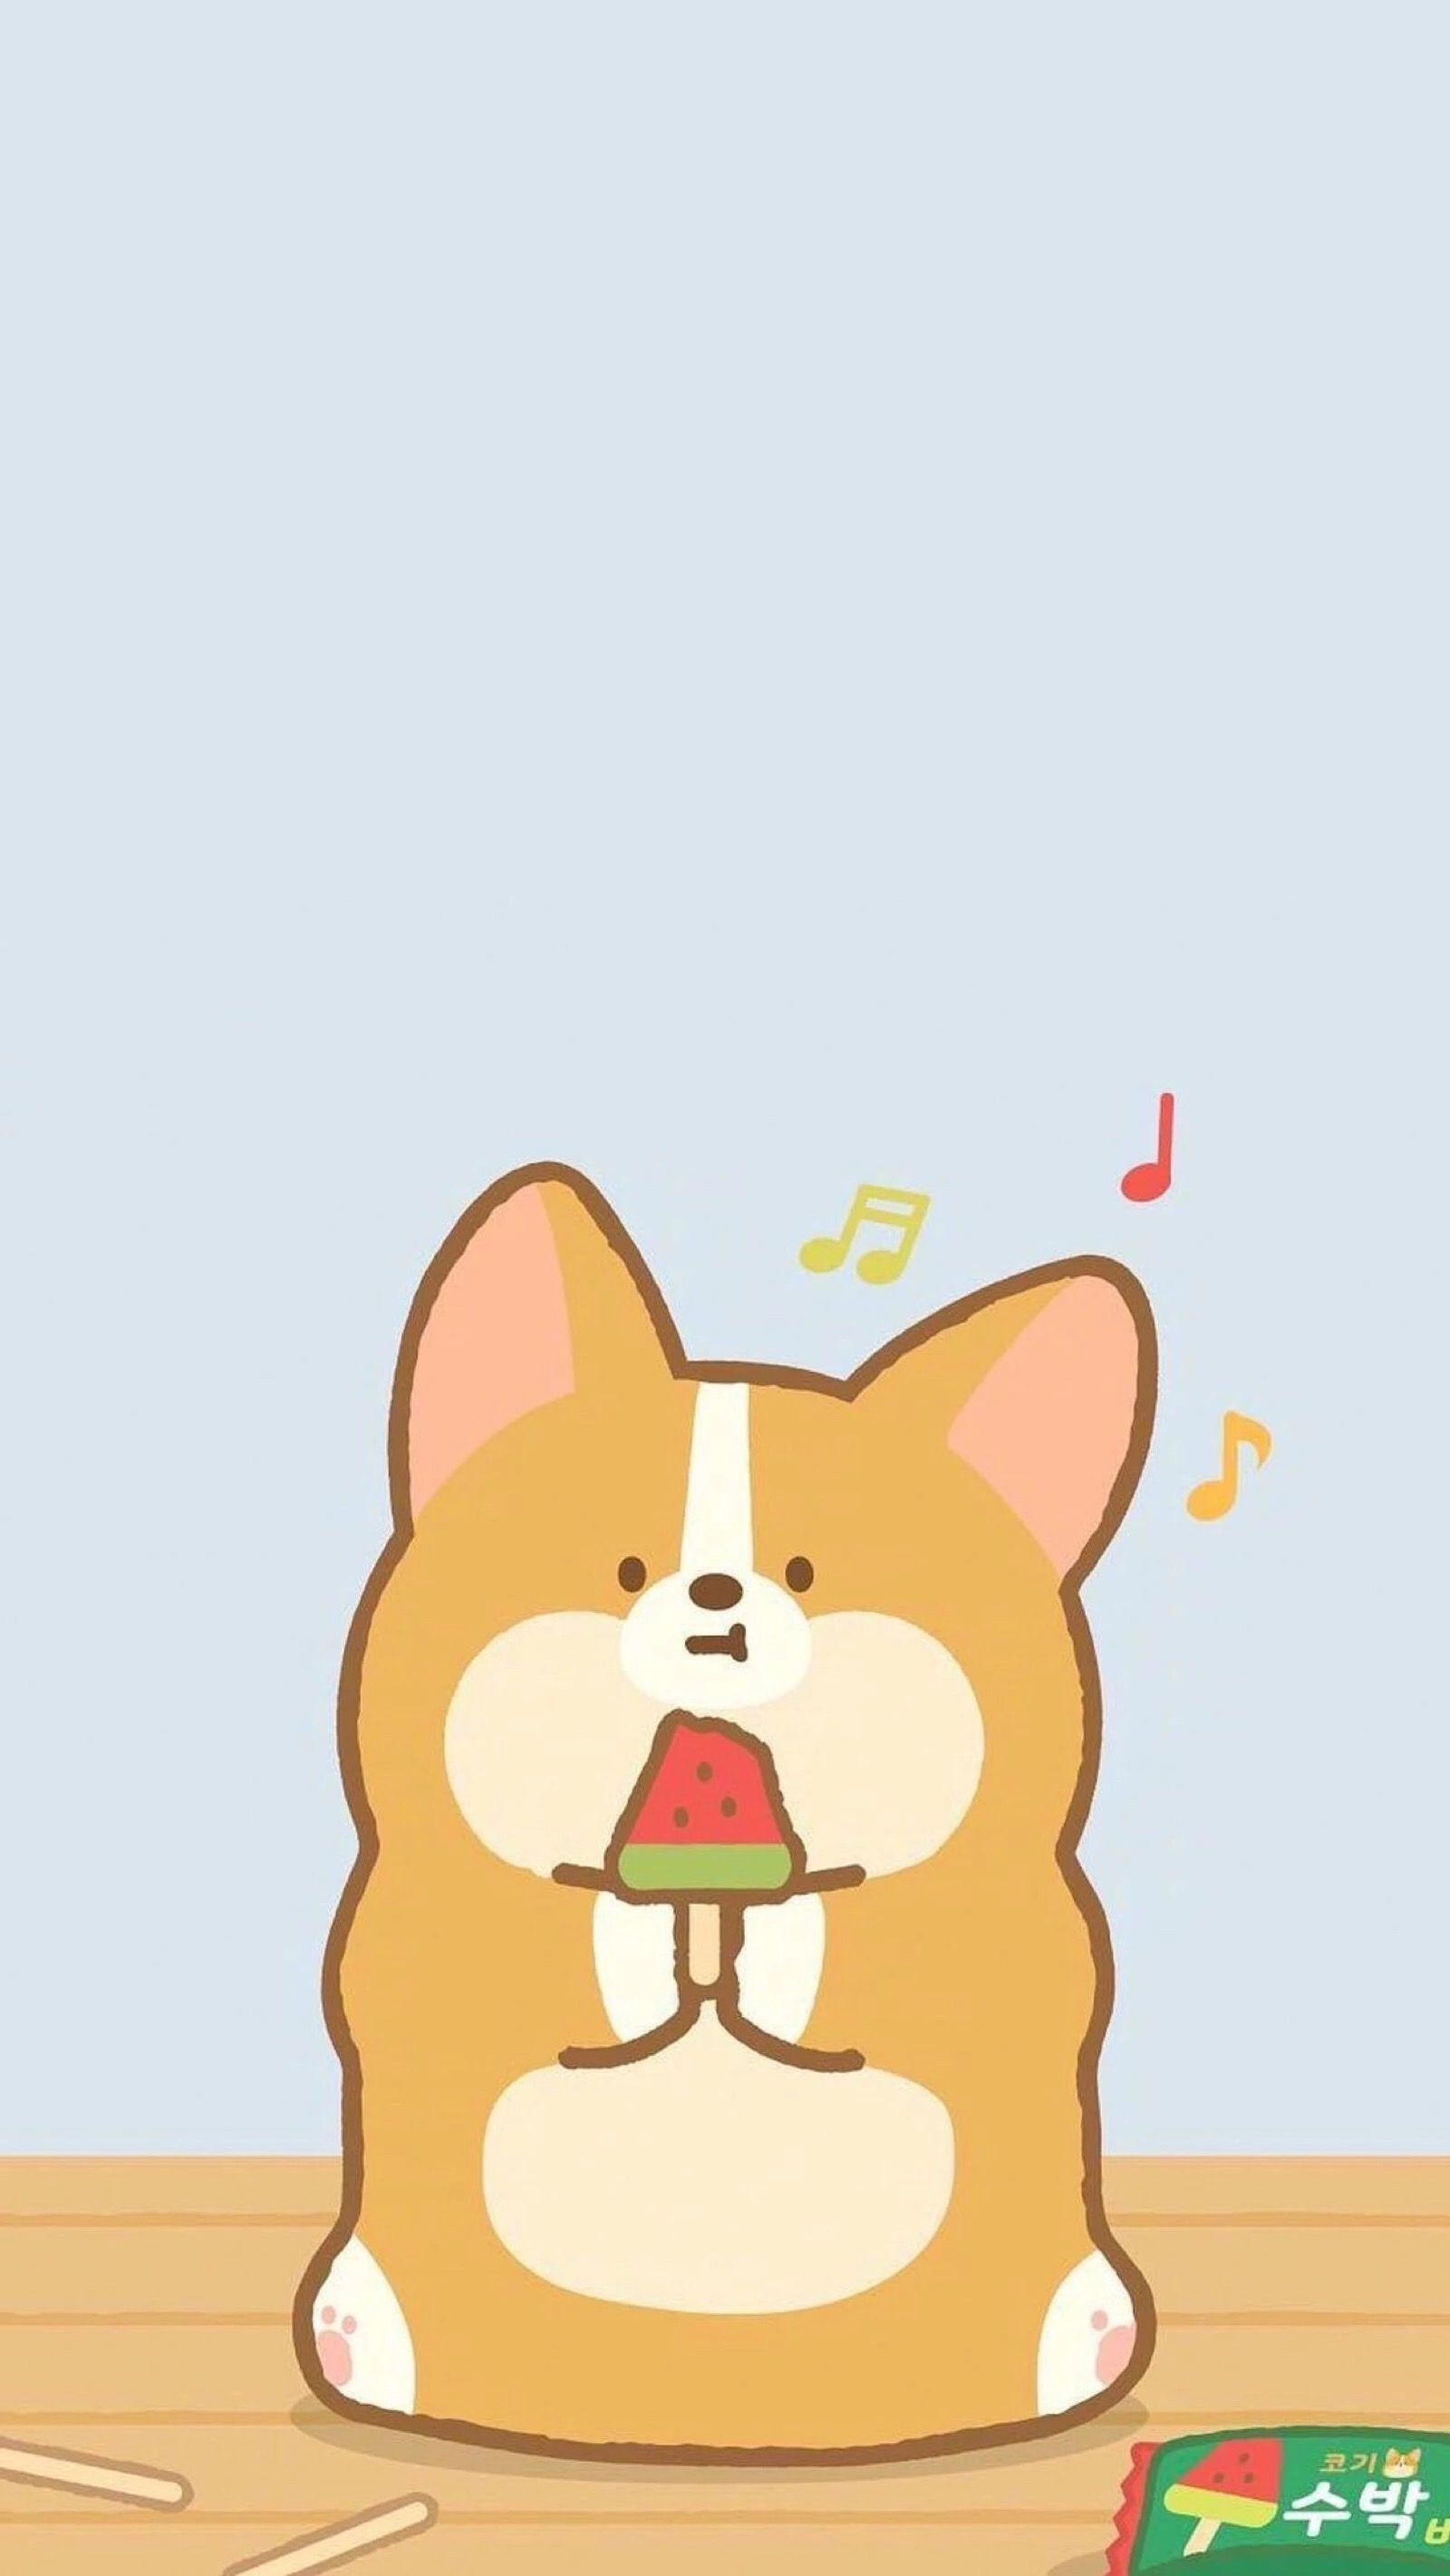 Pin By Ruri Gokou On Cute Wallpaper Cute Wallpapers Cartoon Wallpaper Iphone Cute Drawings